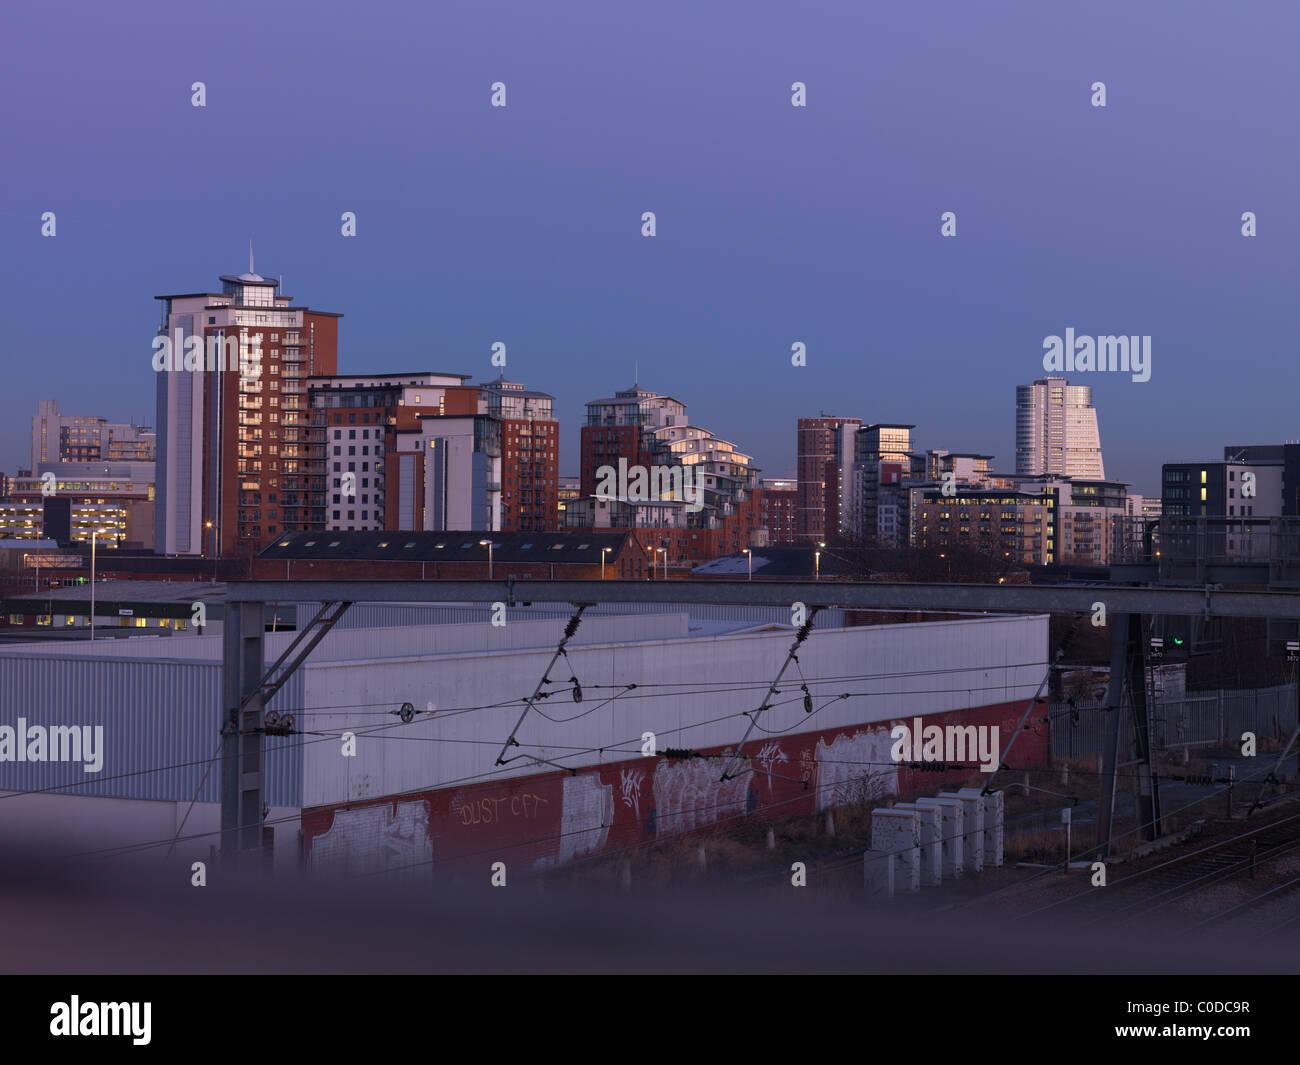 Leeds City Centre from Armley railway bridge - Stock Image